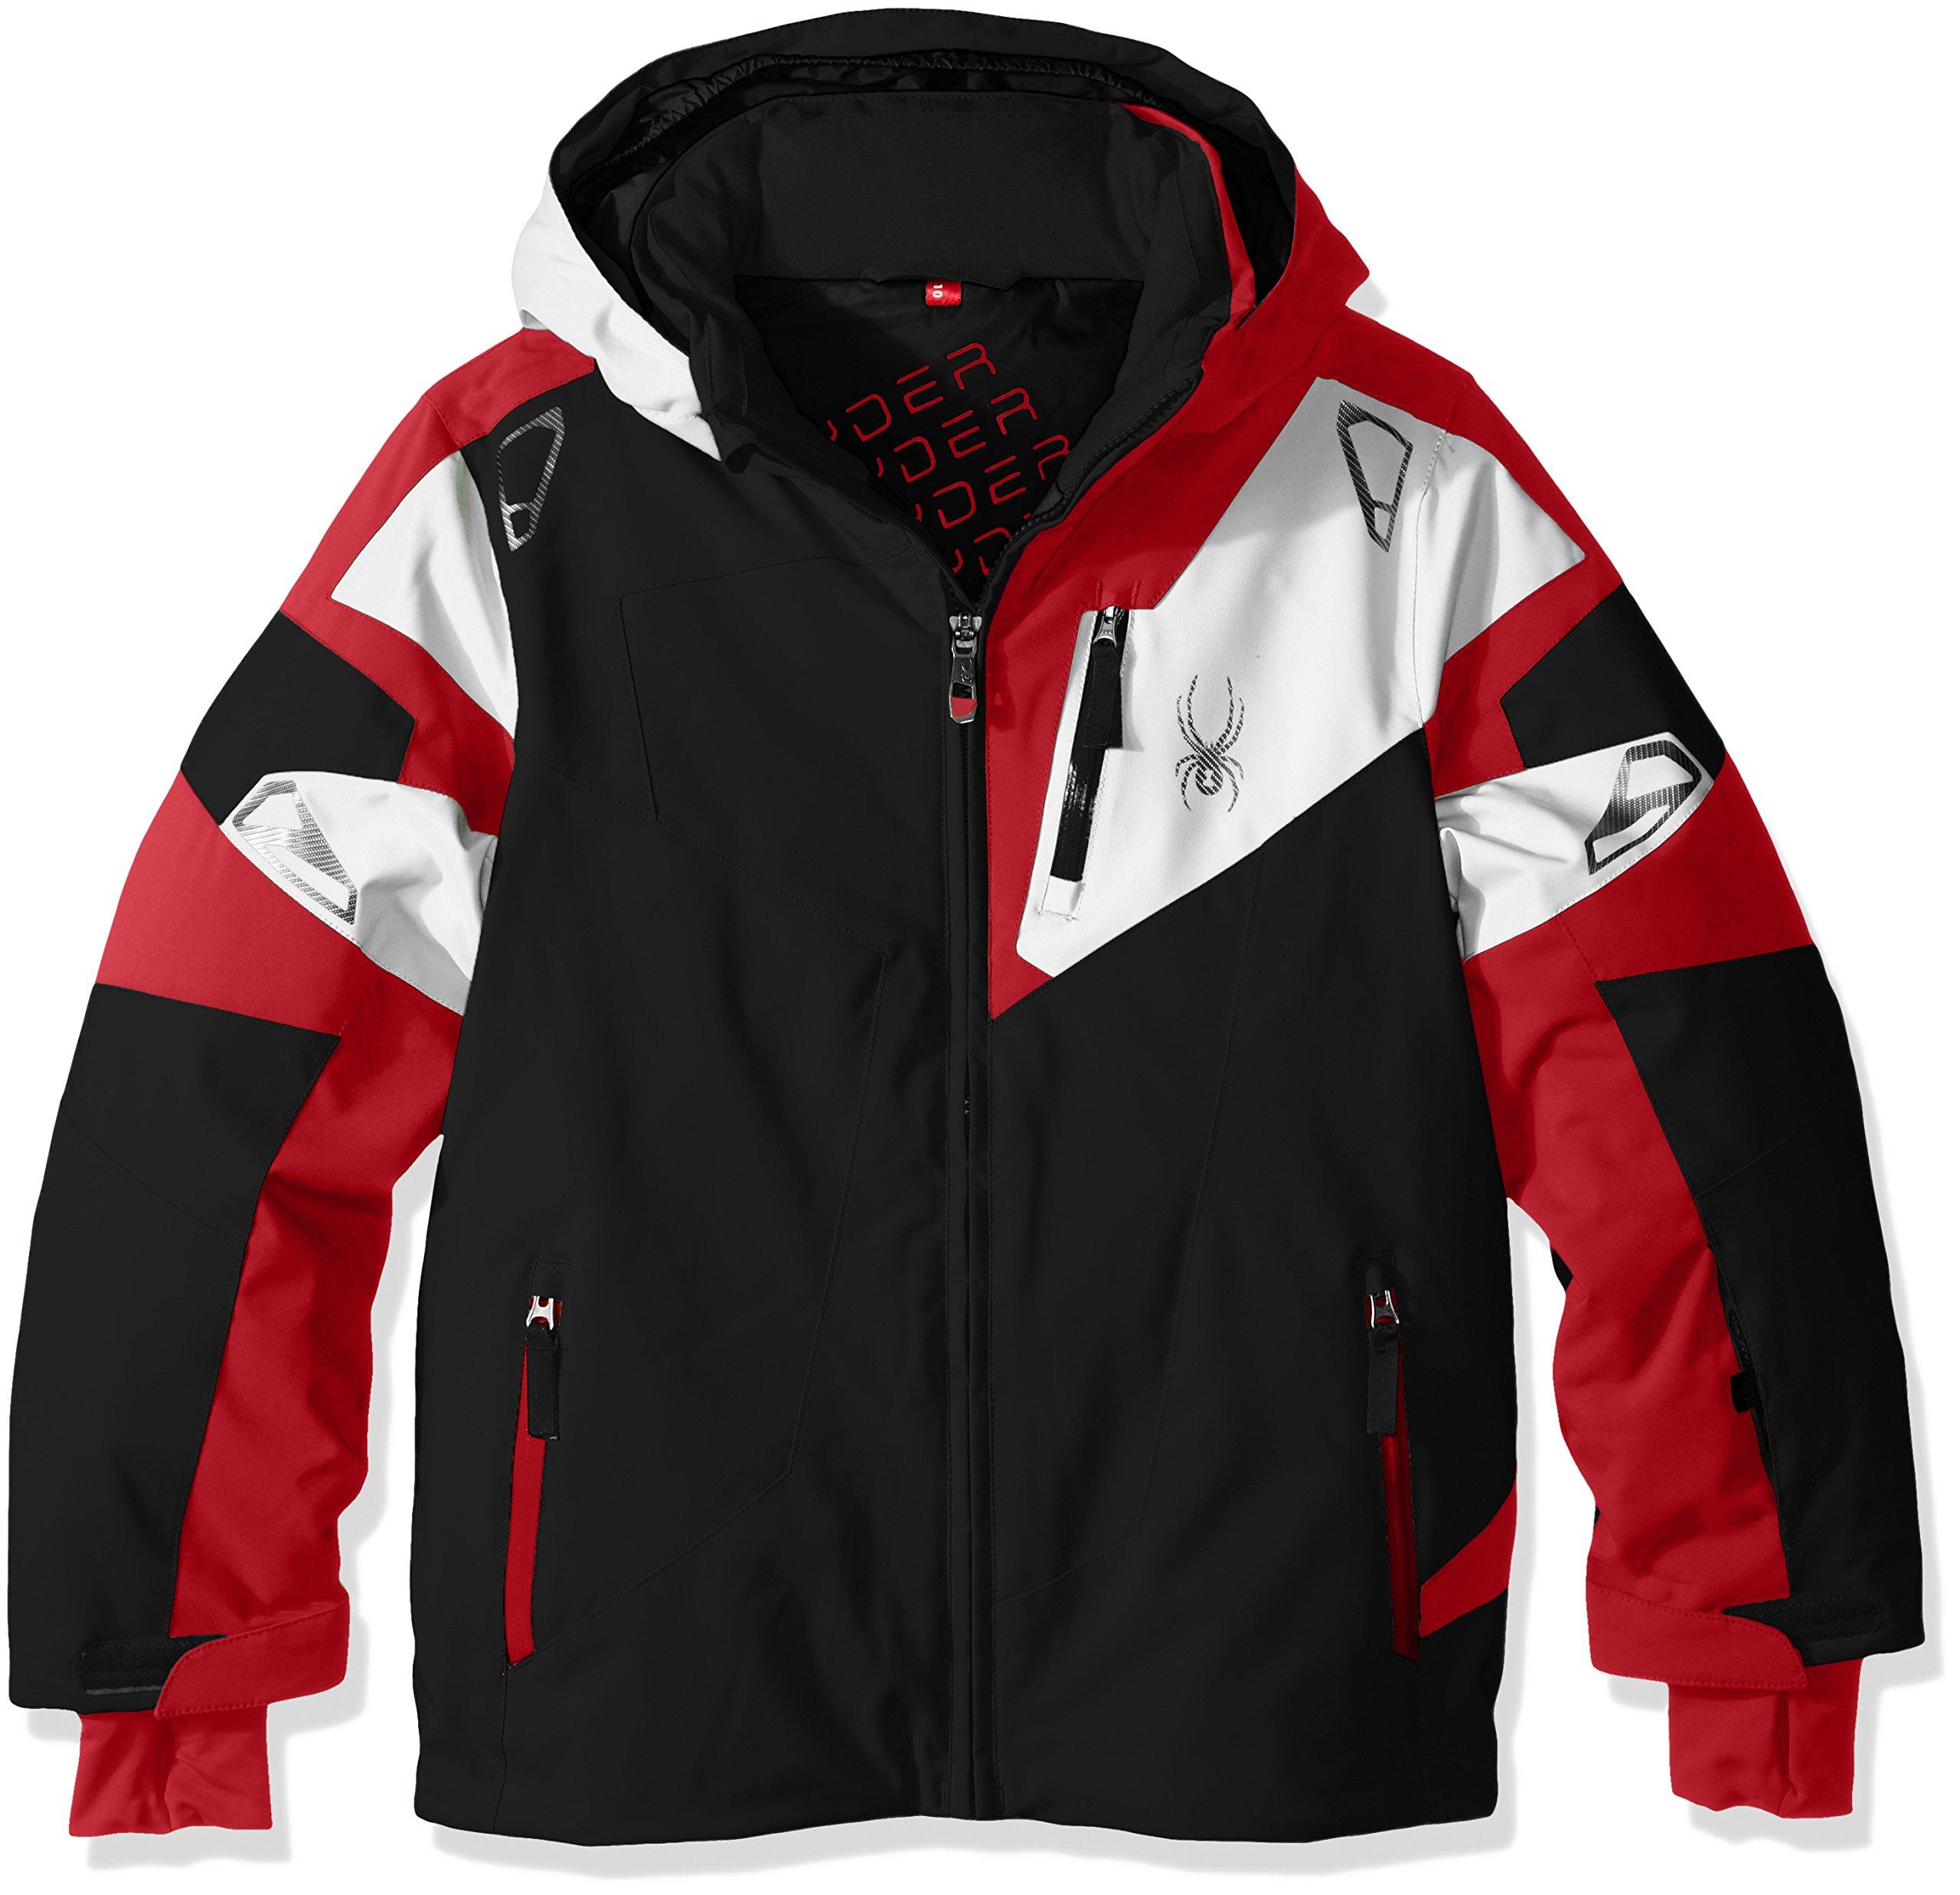 Spyder Boys Leader Jacket, Size 12, Black/Formula/White by Spyder